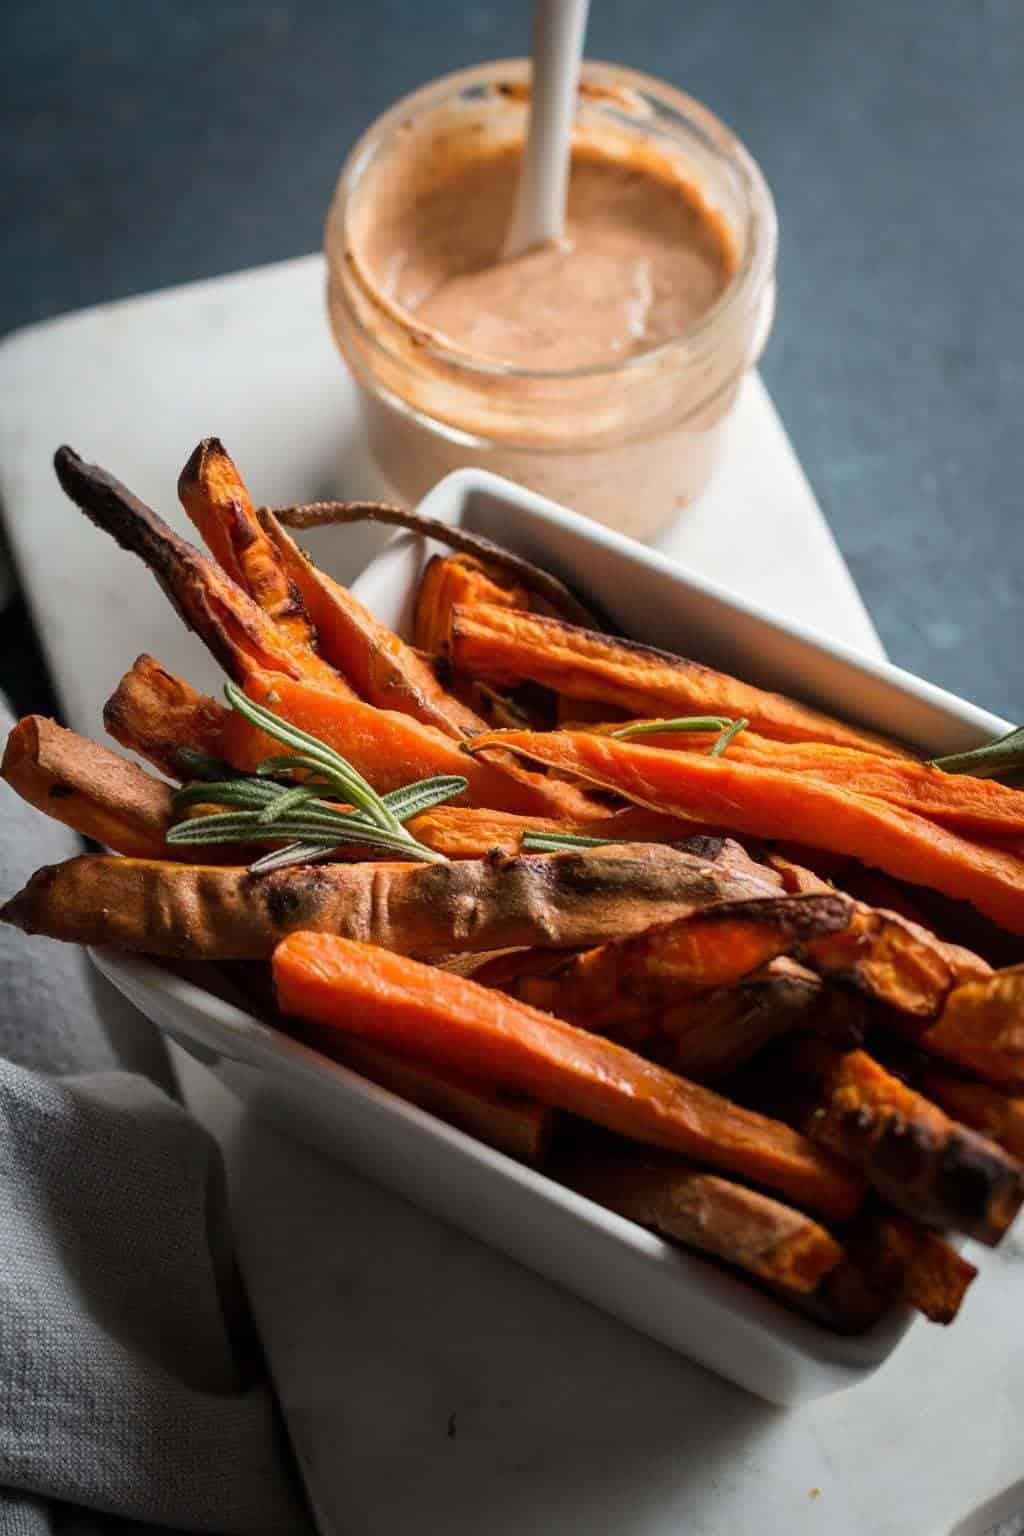 Roasted Sweet Potatoes with 2-Minute Vegan Aioli